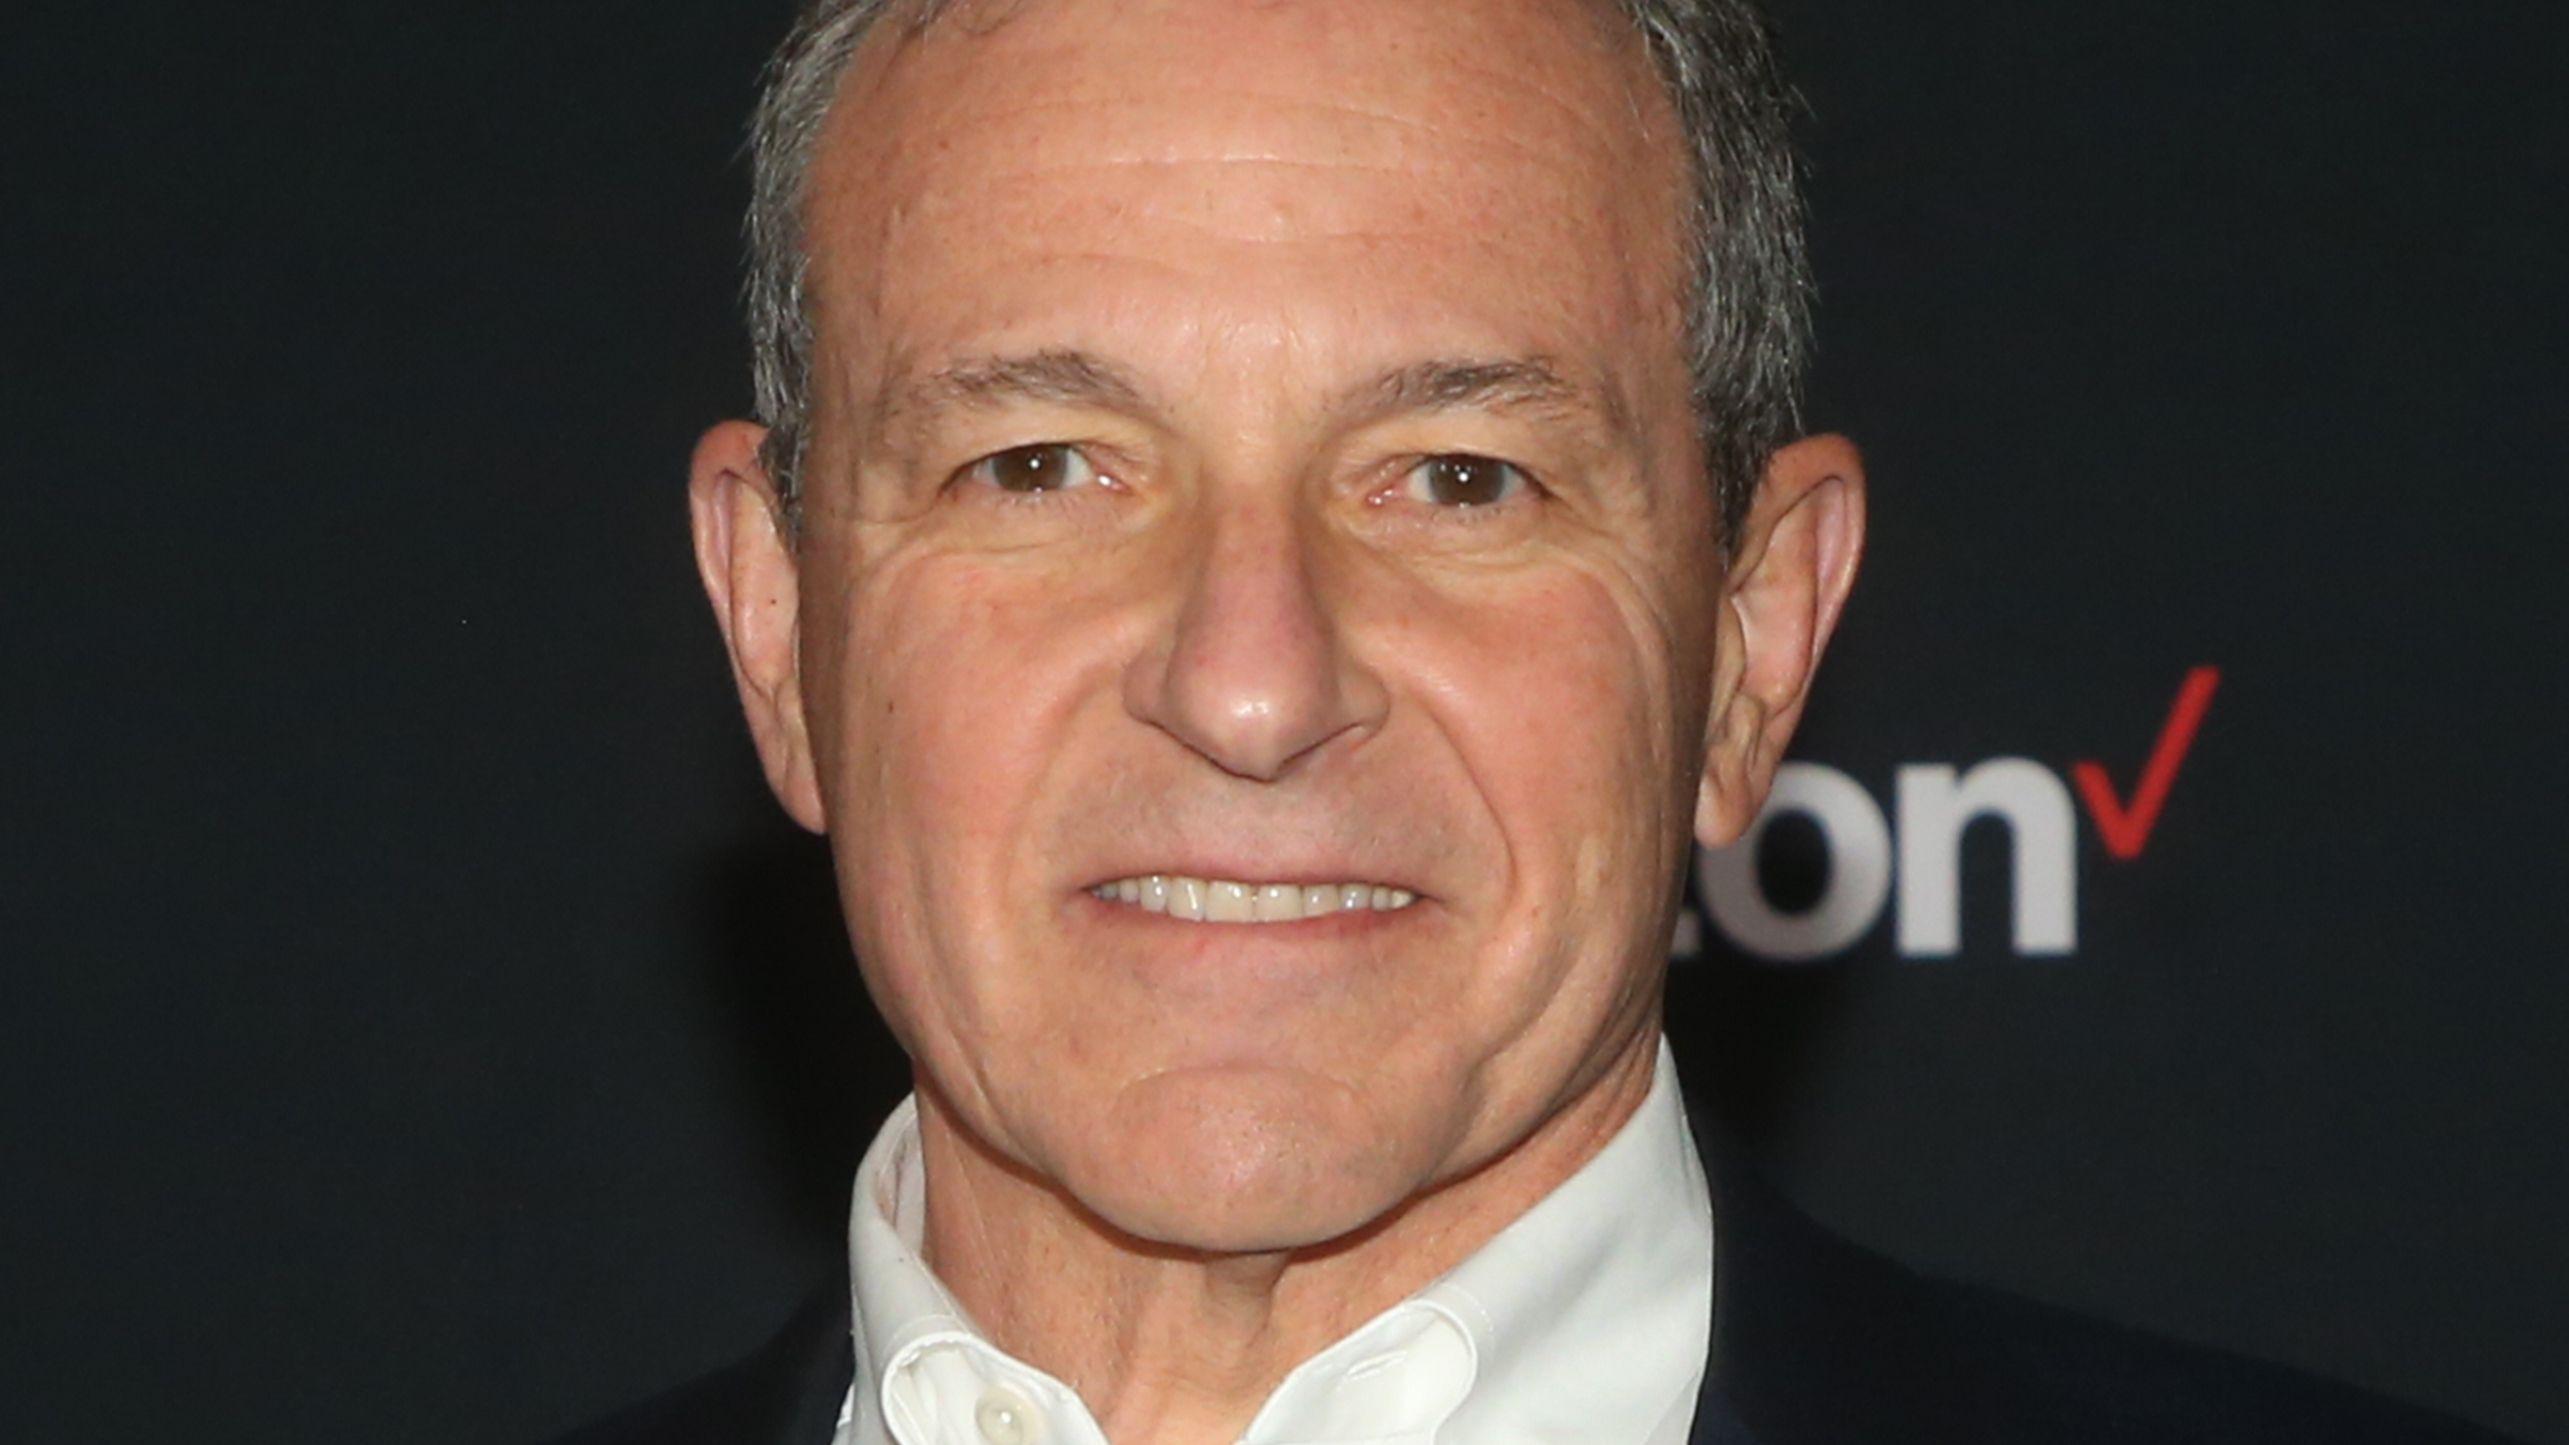 Medienkonzern: Disney-Chef Bob Iger tritt zurück - Bob Chapek zum Nachfolger ernannt